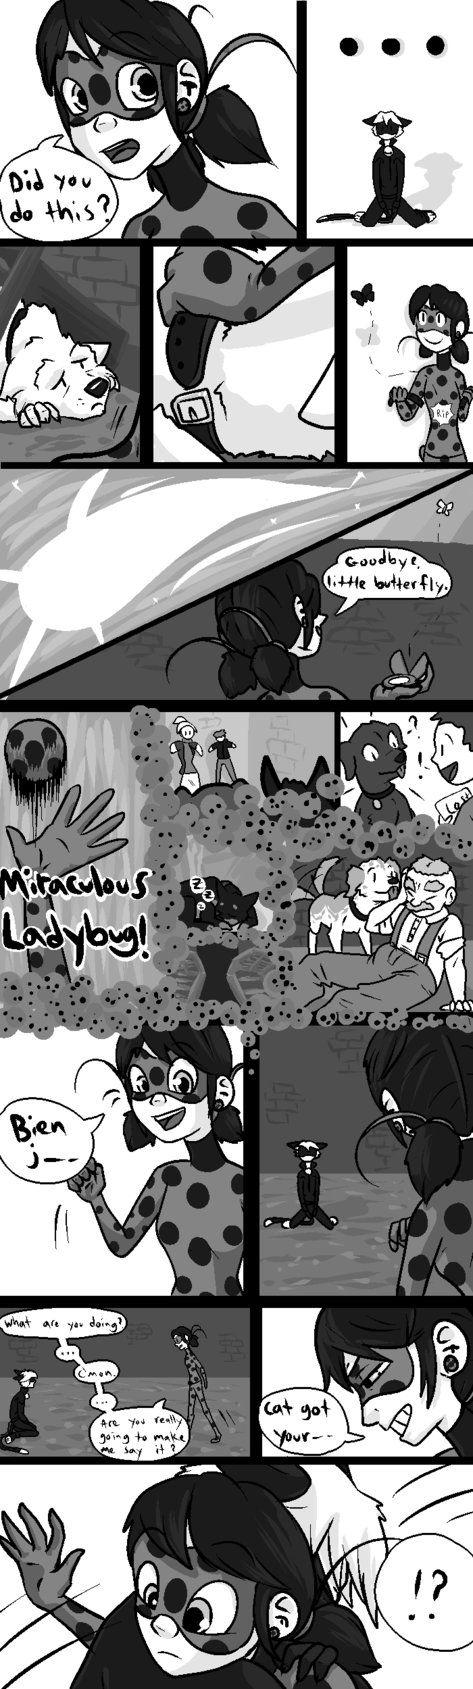 ML Comic Ch 1 Pg 24 by SleepySundae.deviantart.com on @DeviantArt